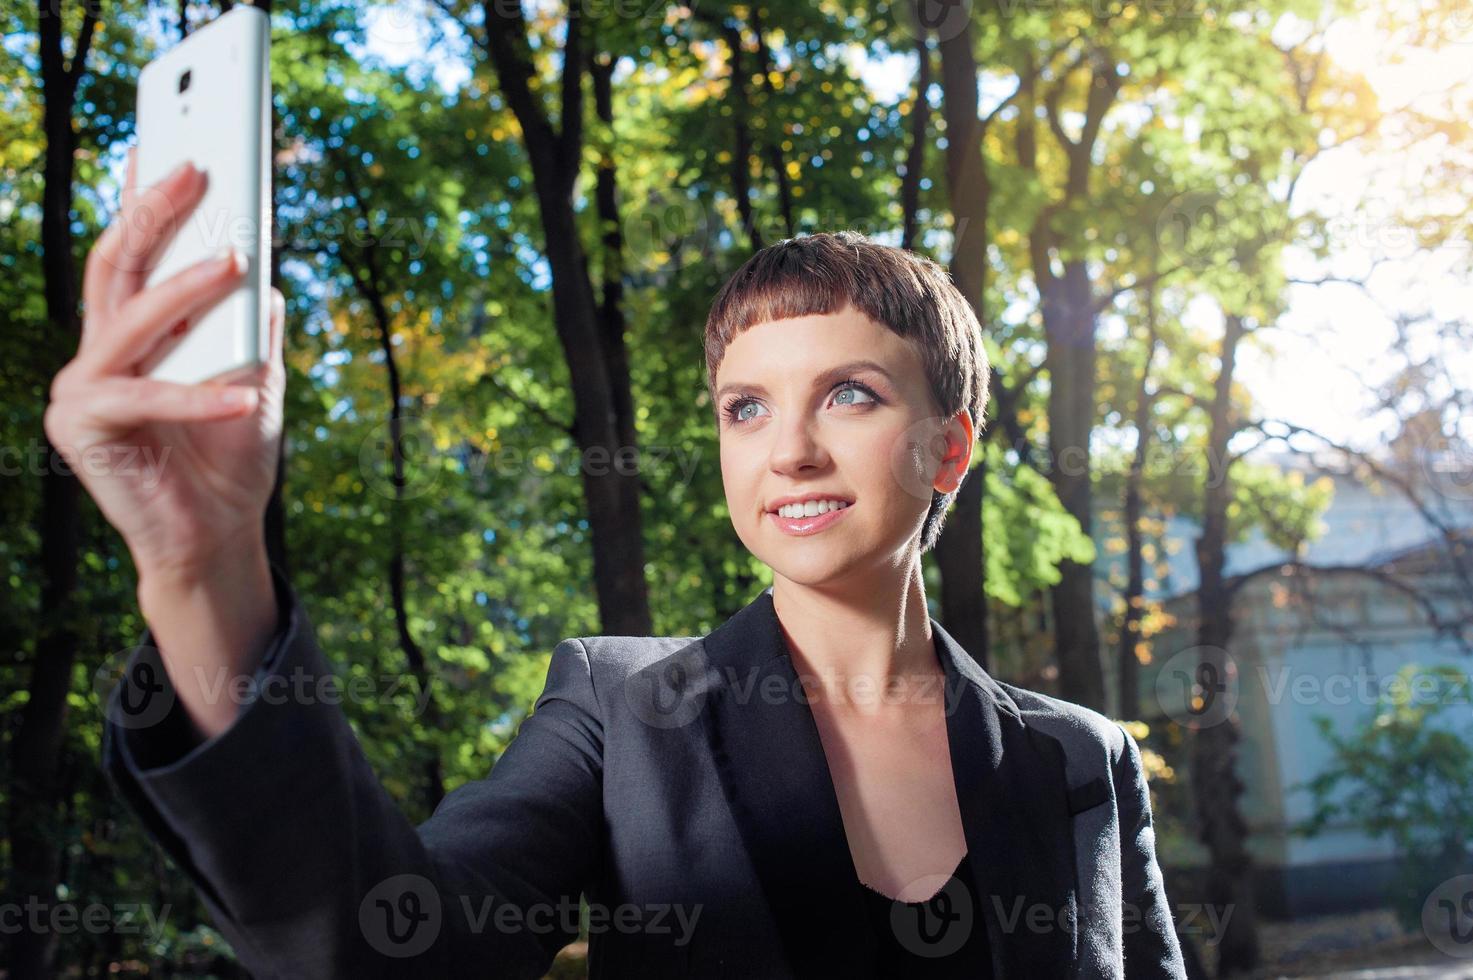 jolie femme en vetu prenant photo avec son téléphone intelligent